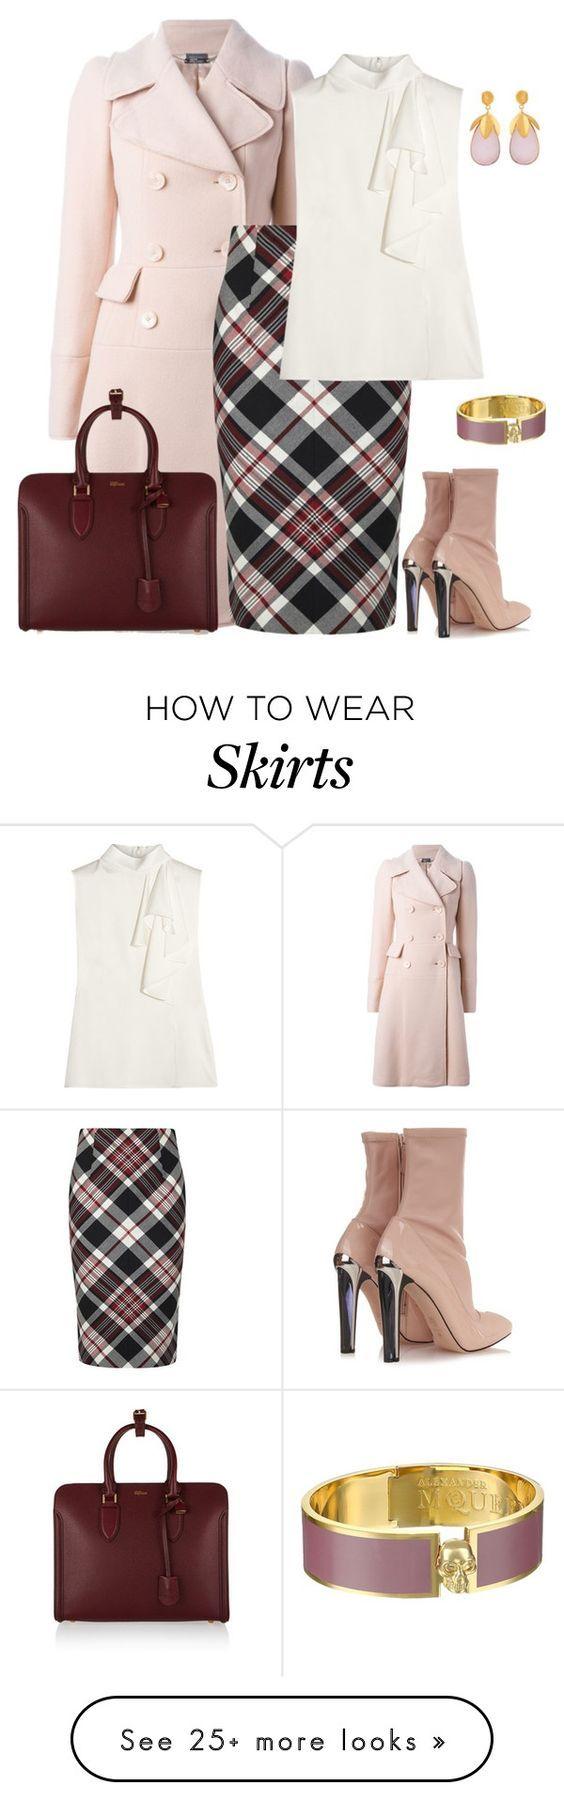 Sobretudo Rosa + Blusa Branca + Saia Colorida + Ankle Boot